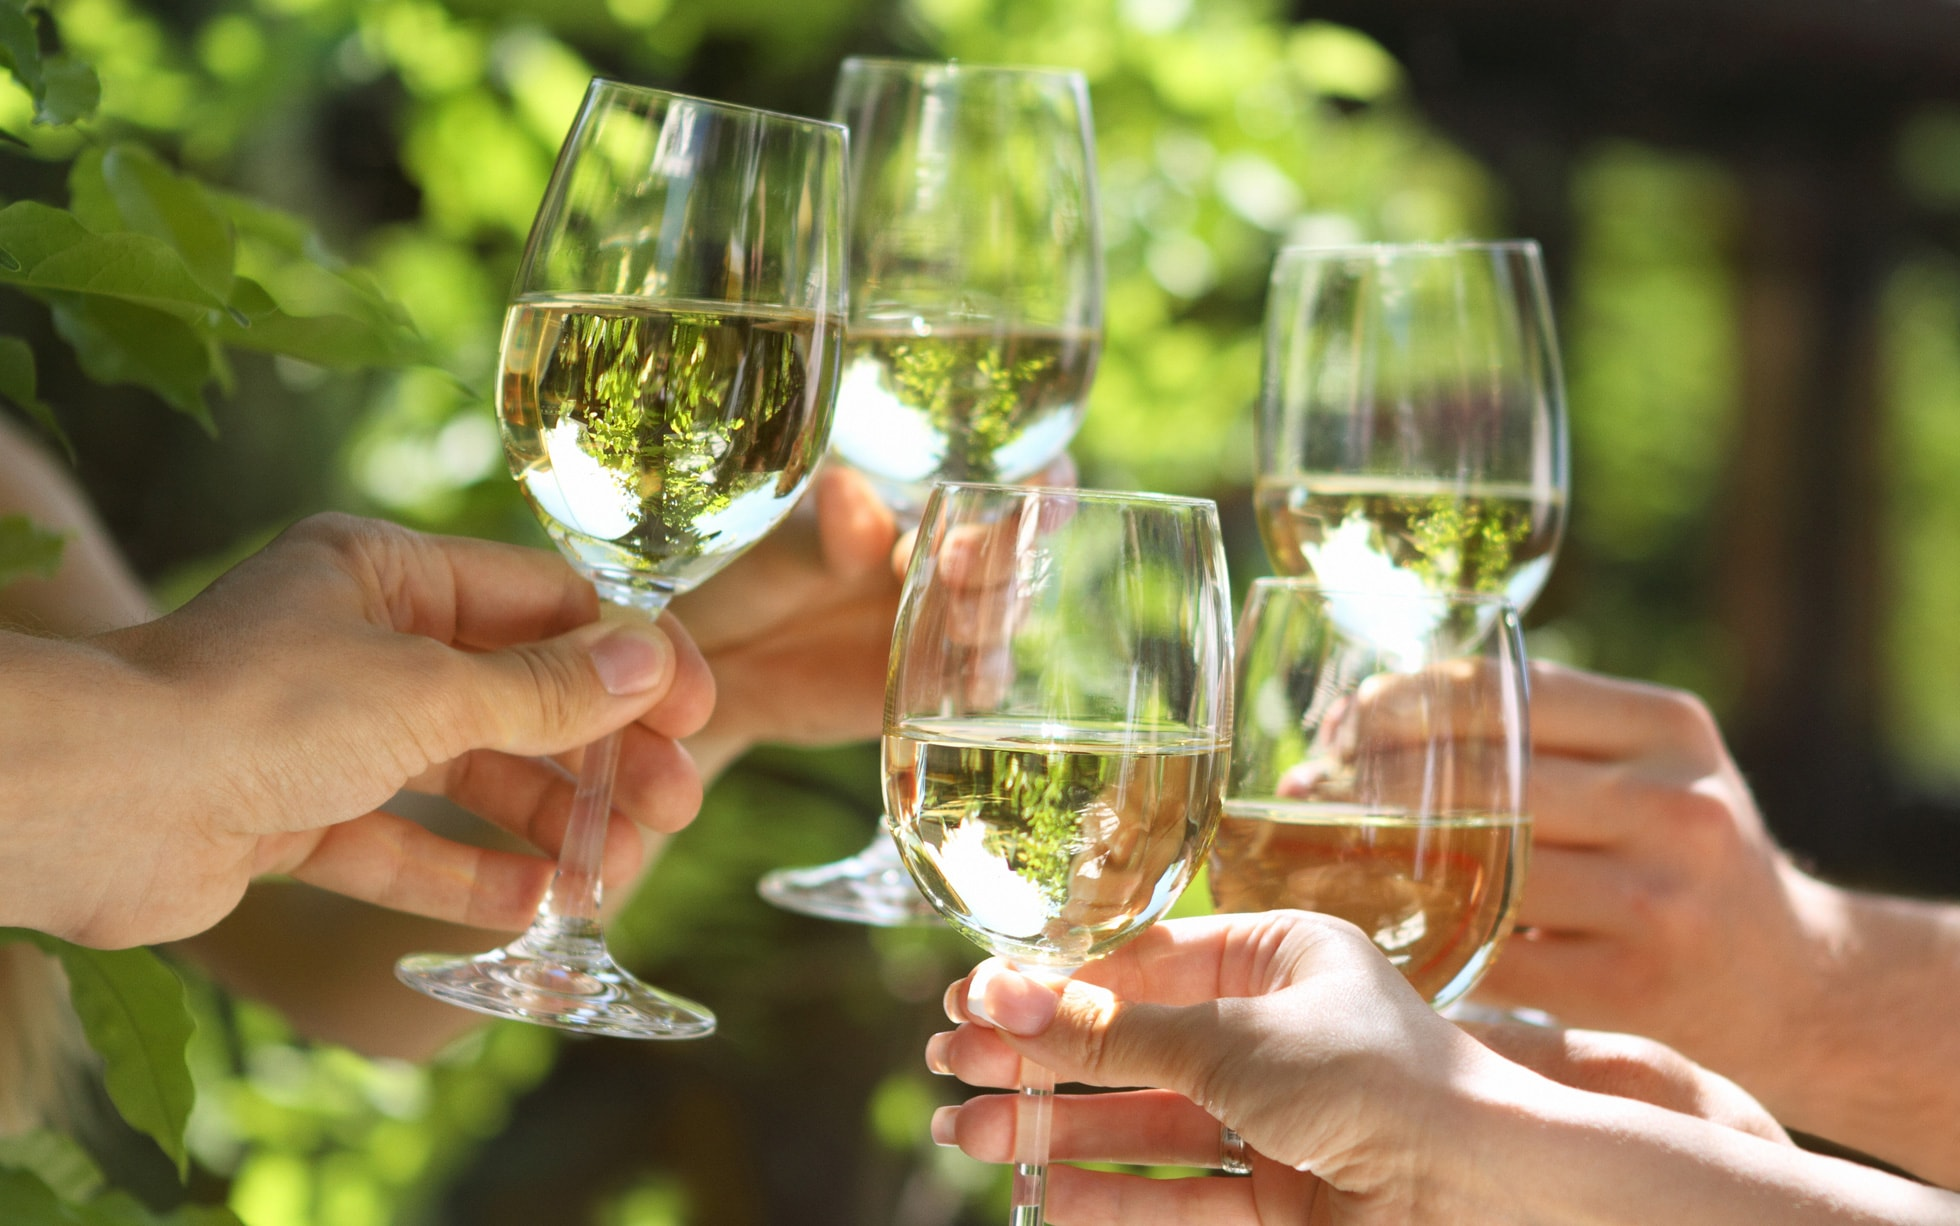 white-wine-glasses-cheers-outdoors